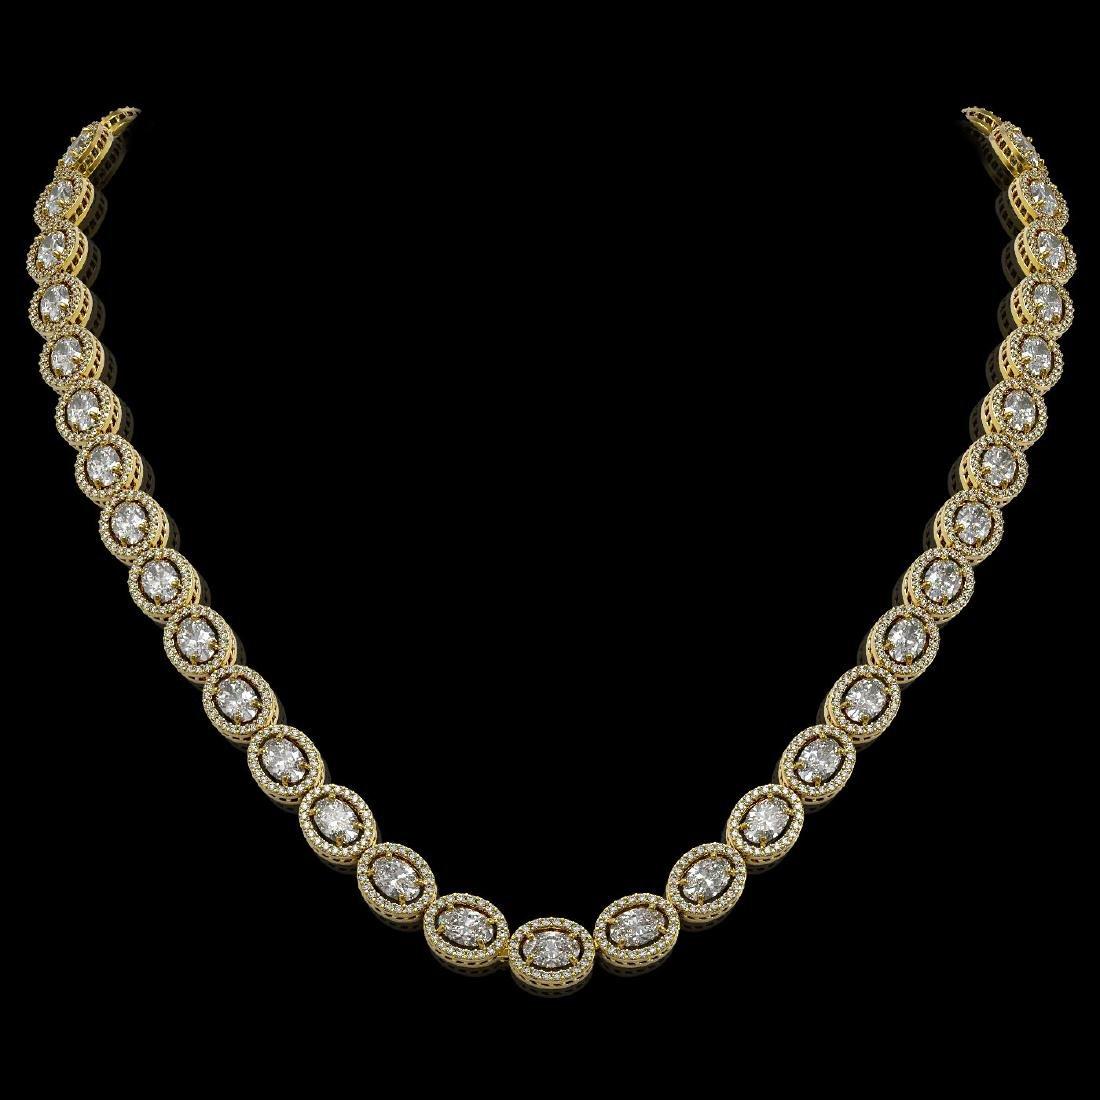 30.41 CTW Oval Diamond Designer Necklace 18K Yellow